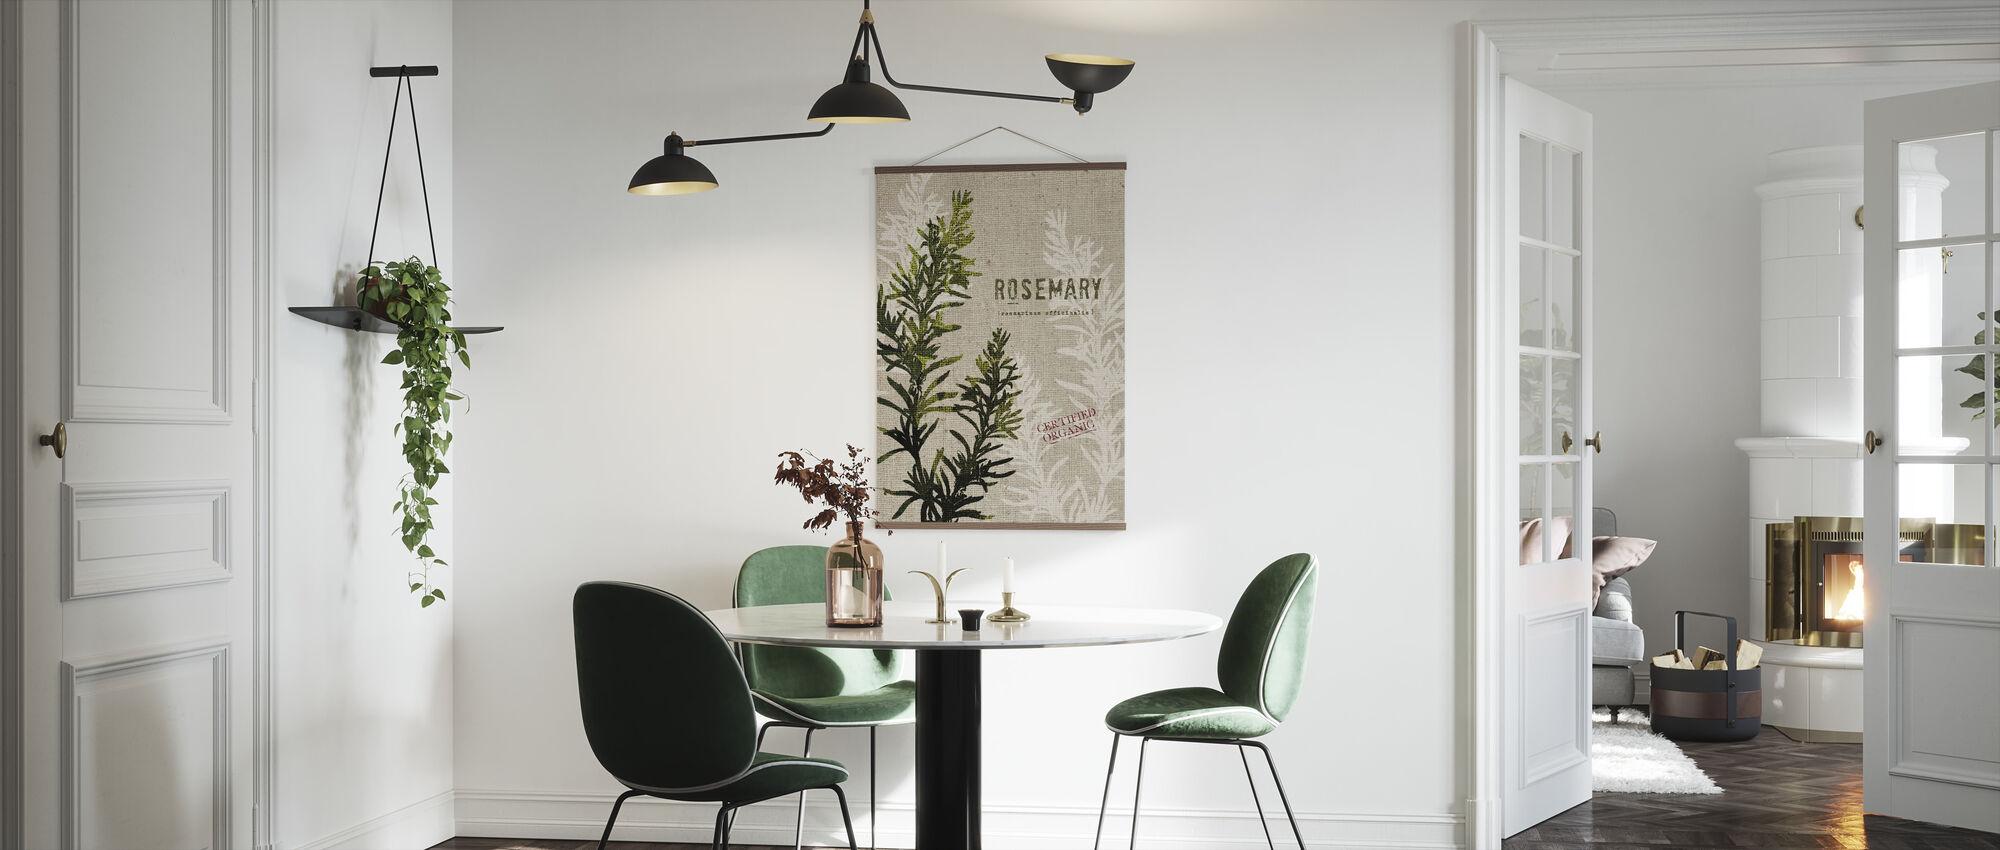 Organic Rosemary - Poster - Kitchen